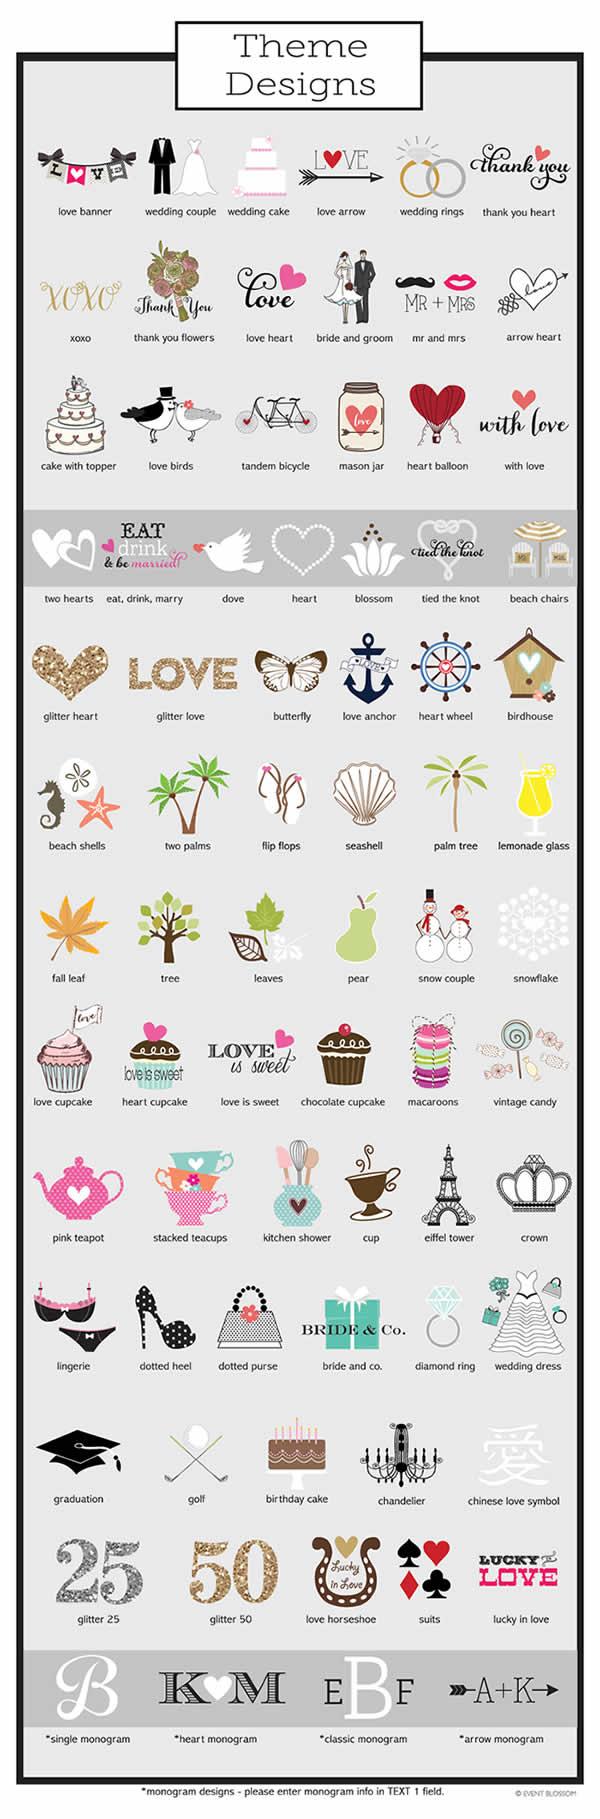 Label Theme Design Options  sc 1 st  Wedding Favors Depot & Hot Beach Wedding Theme Sunscreen Favors